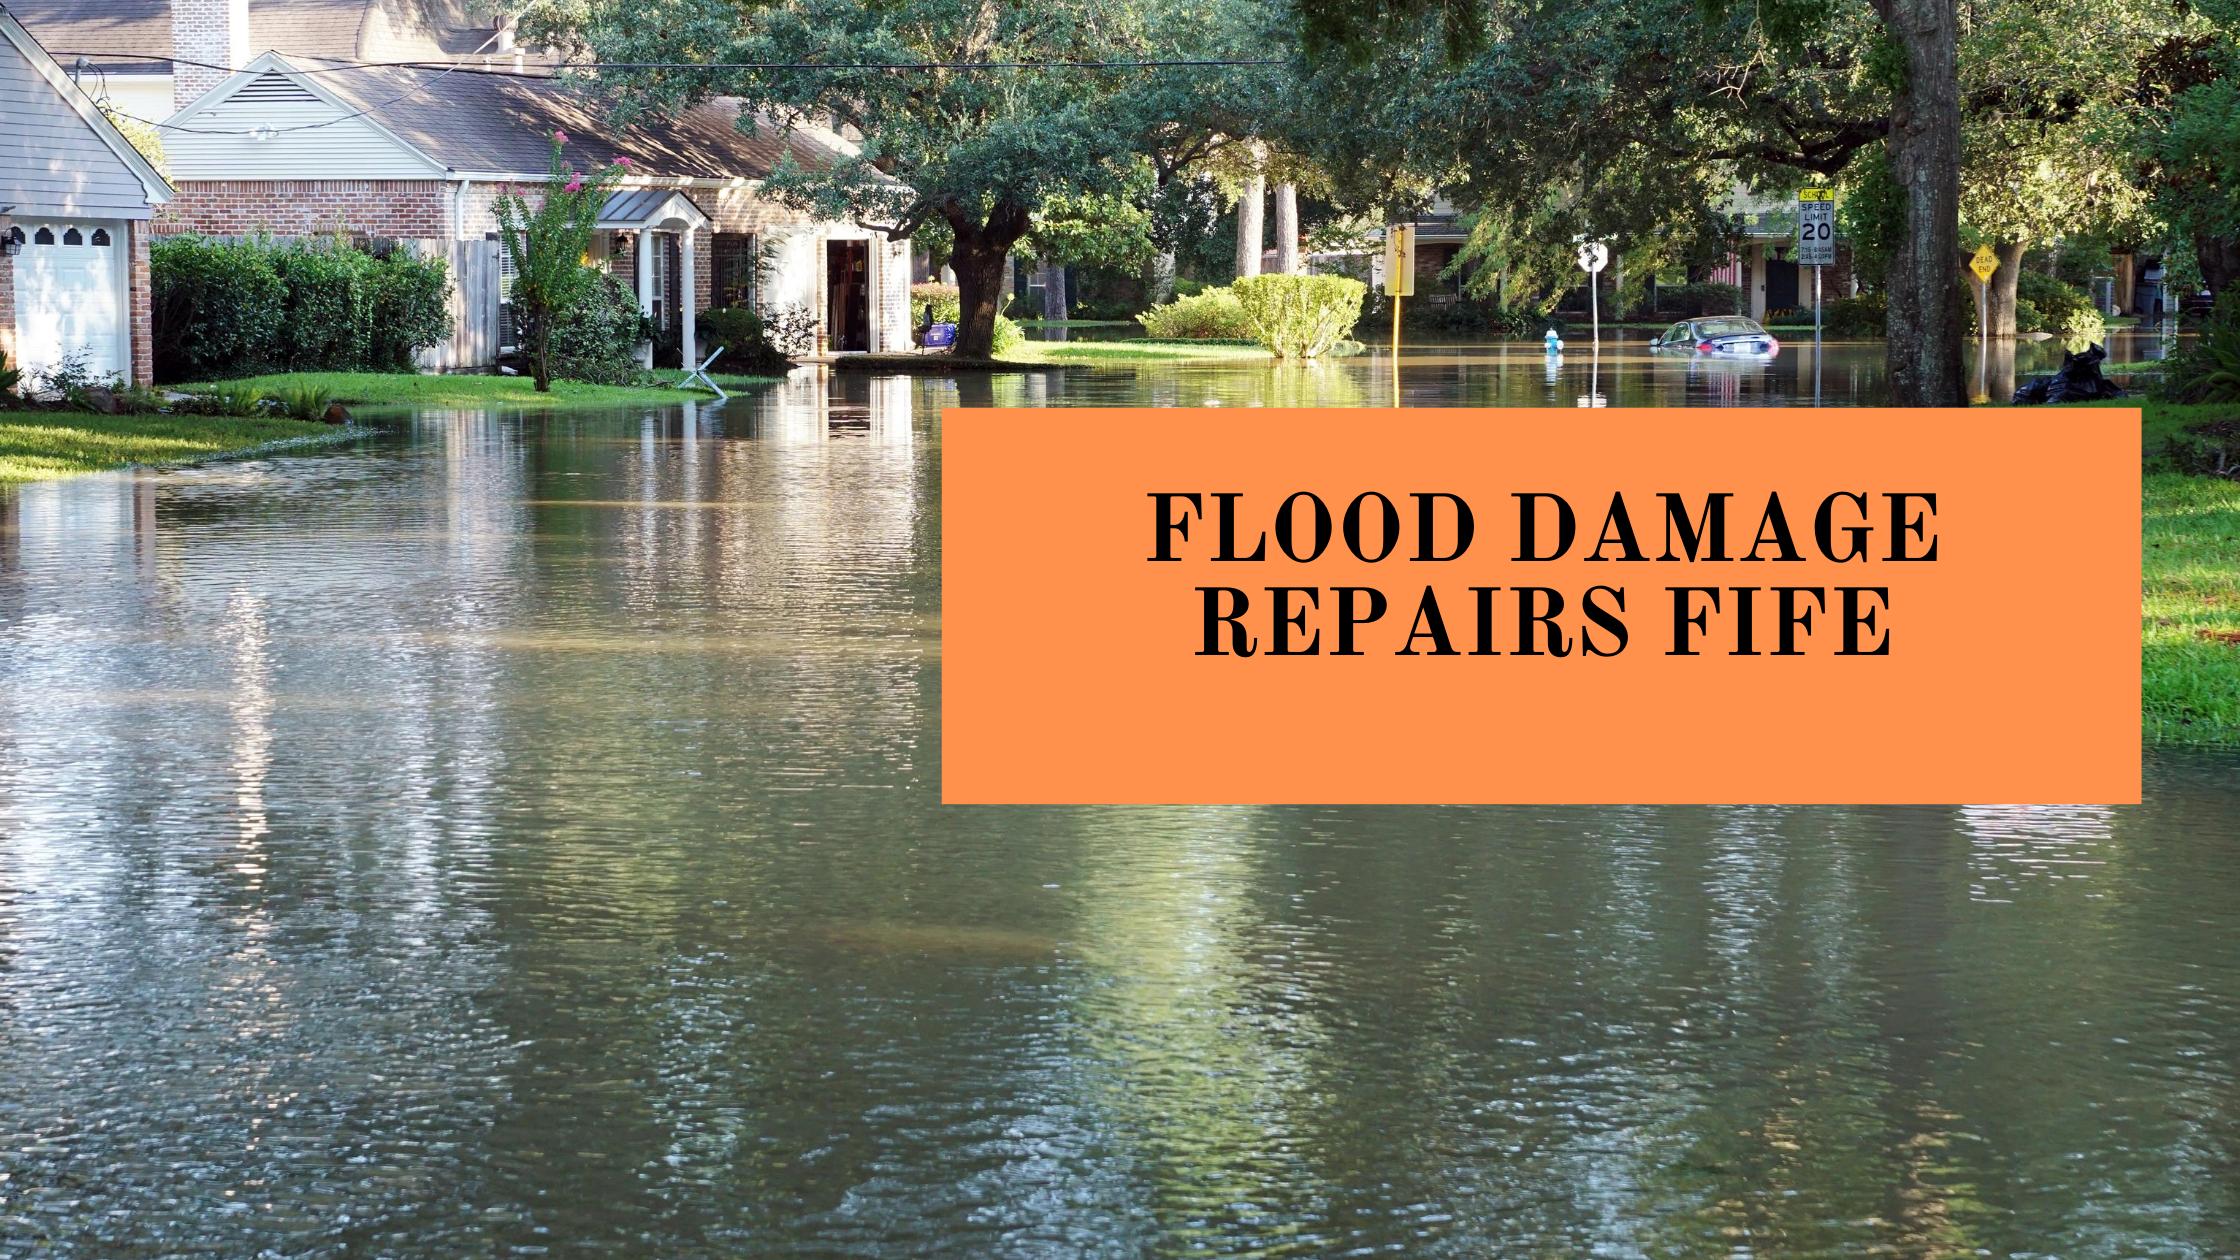 FLOOD DAMAGE REPAIRS FIFE